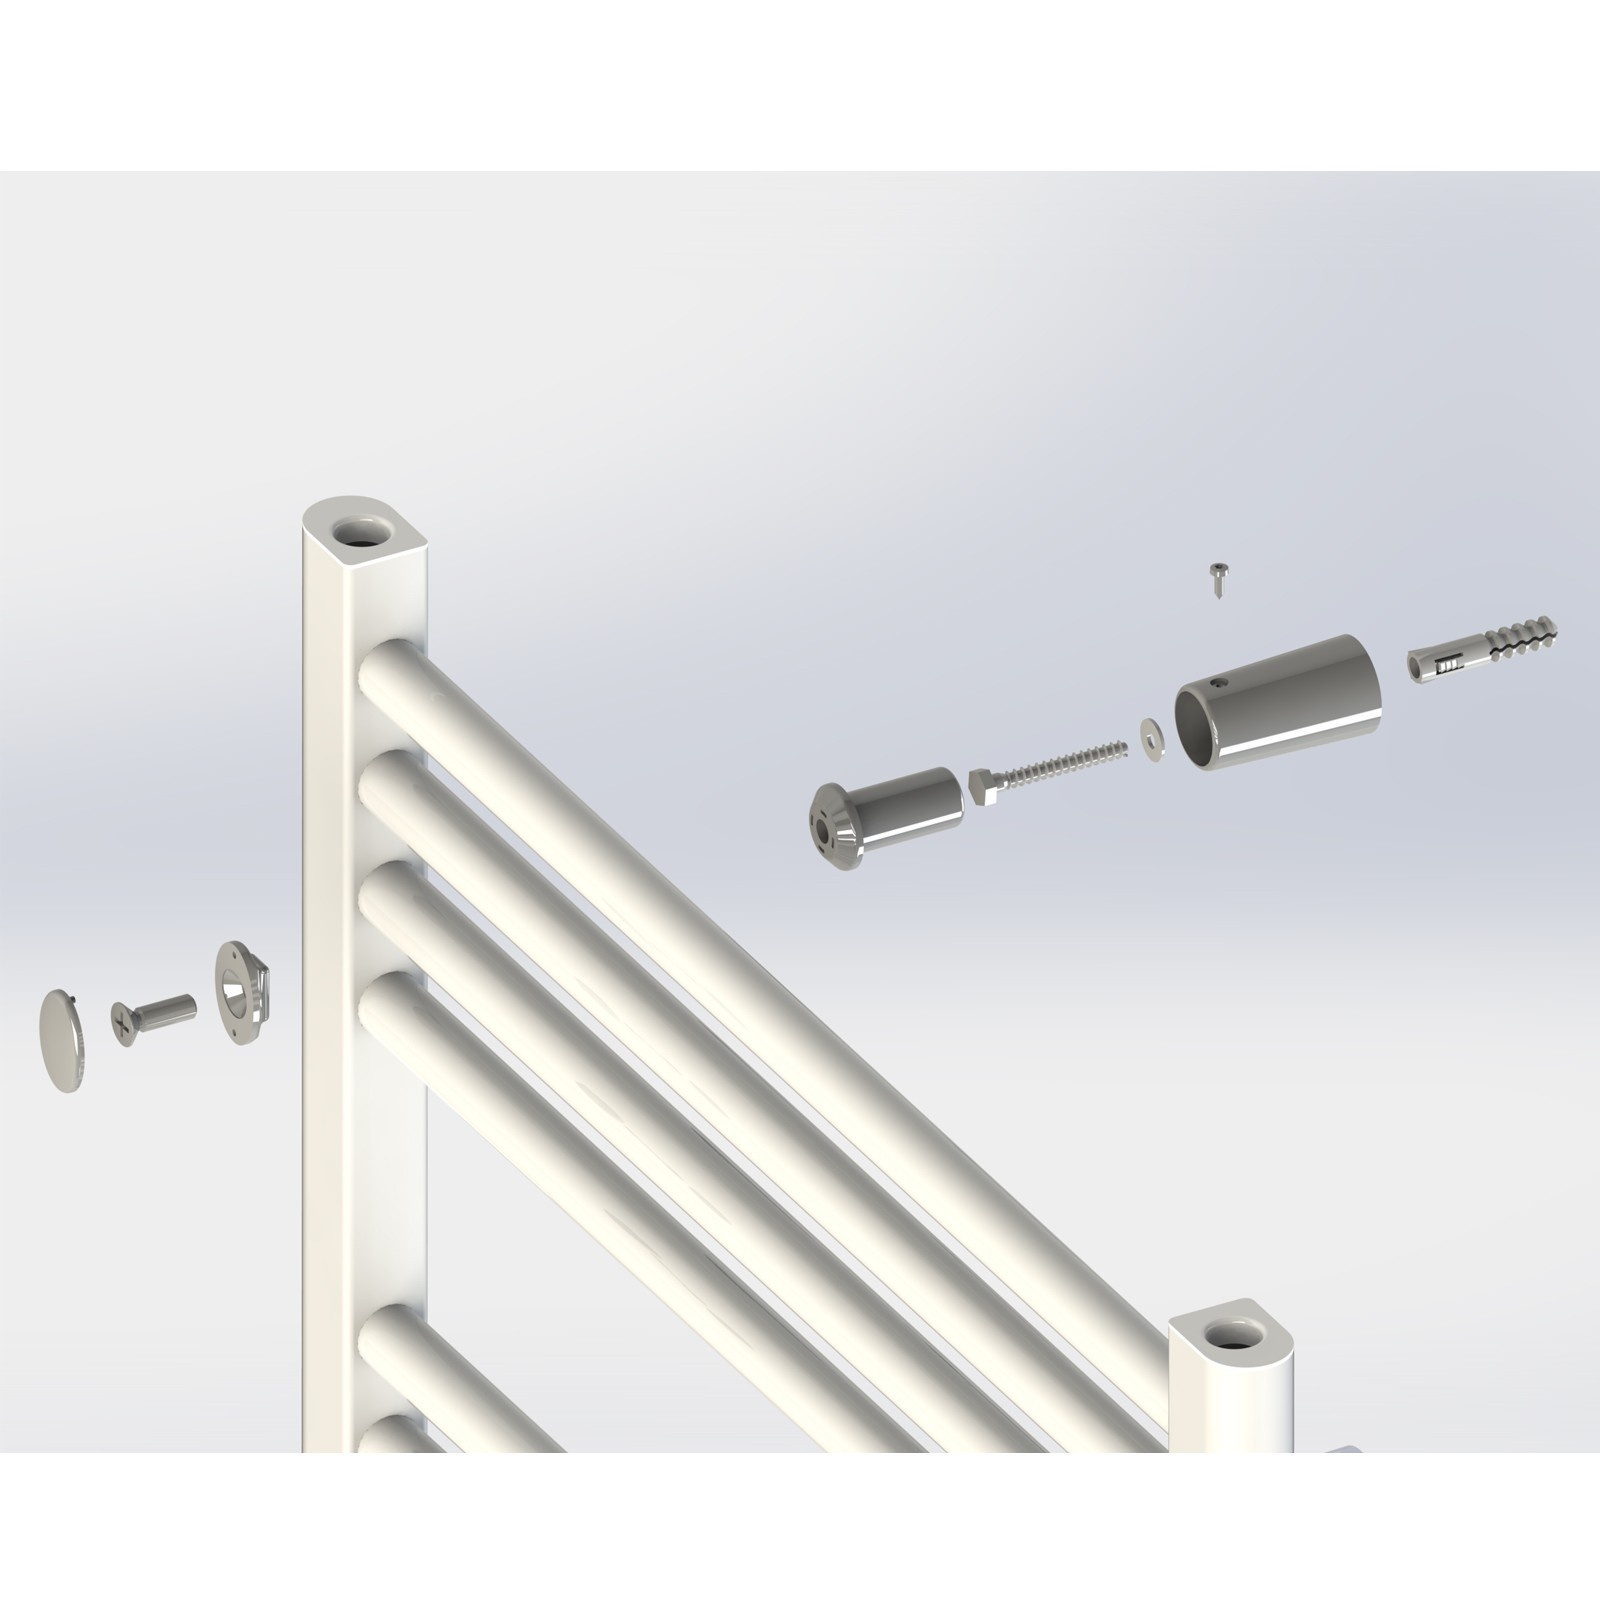 badheizk rper 600x1000 mm 60x100 cm gerade au enanschlu handtuchheizk rper ebay. Black Bedroom Furniture Sets. Home Design Ideas